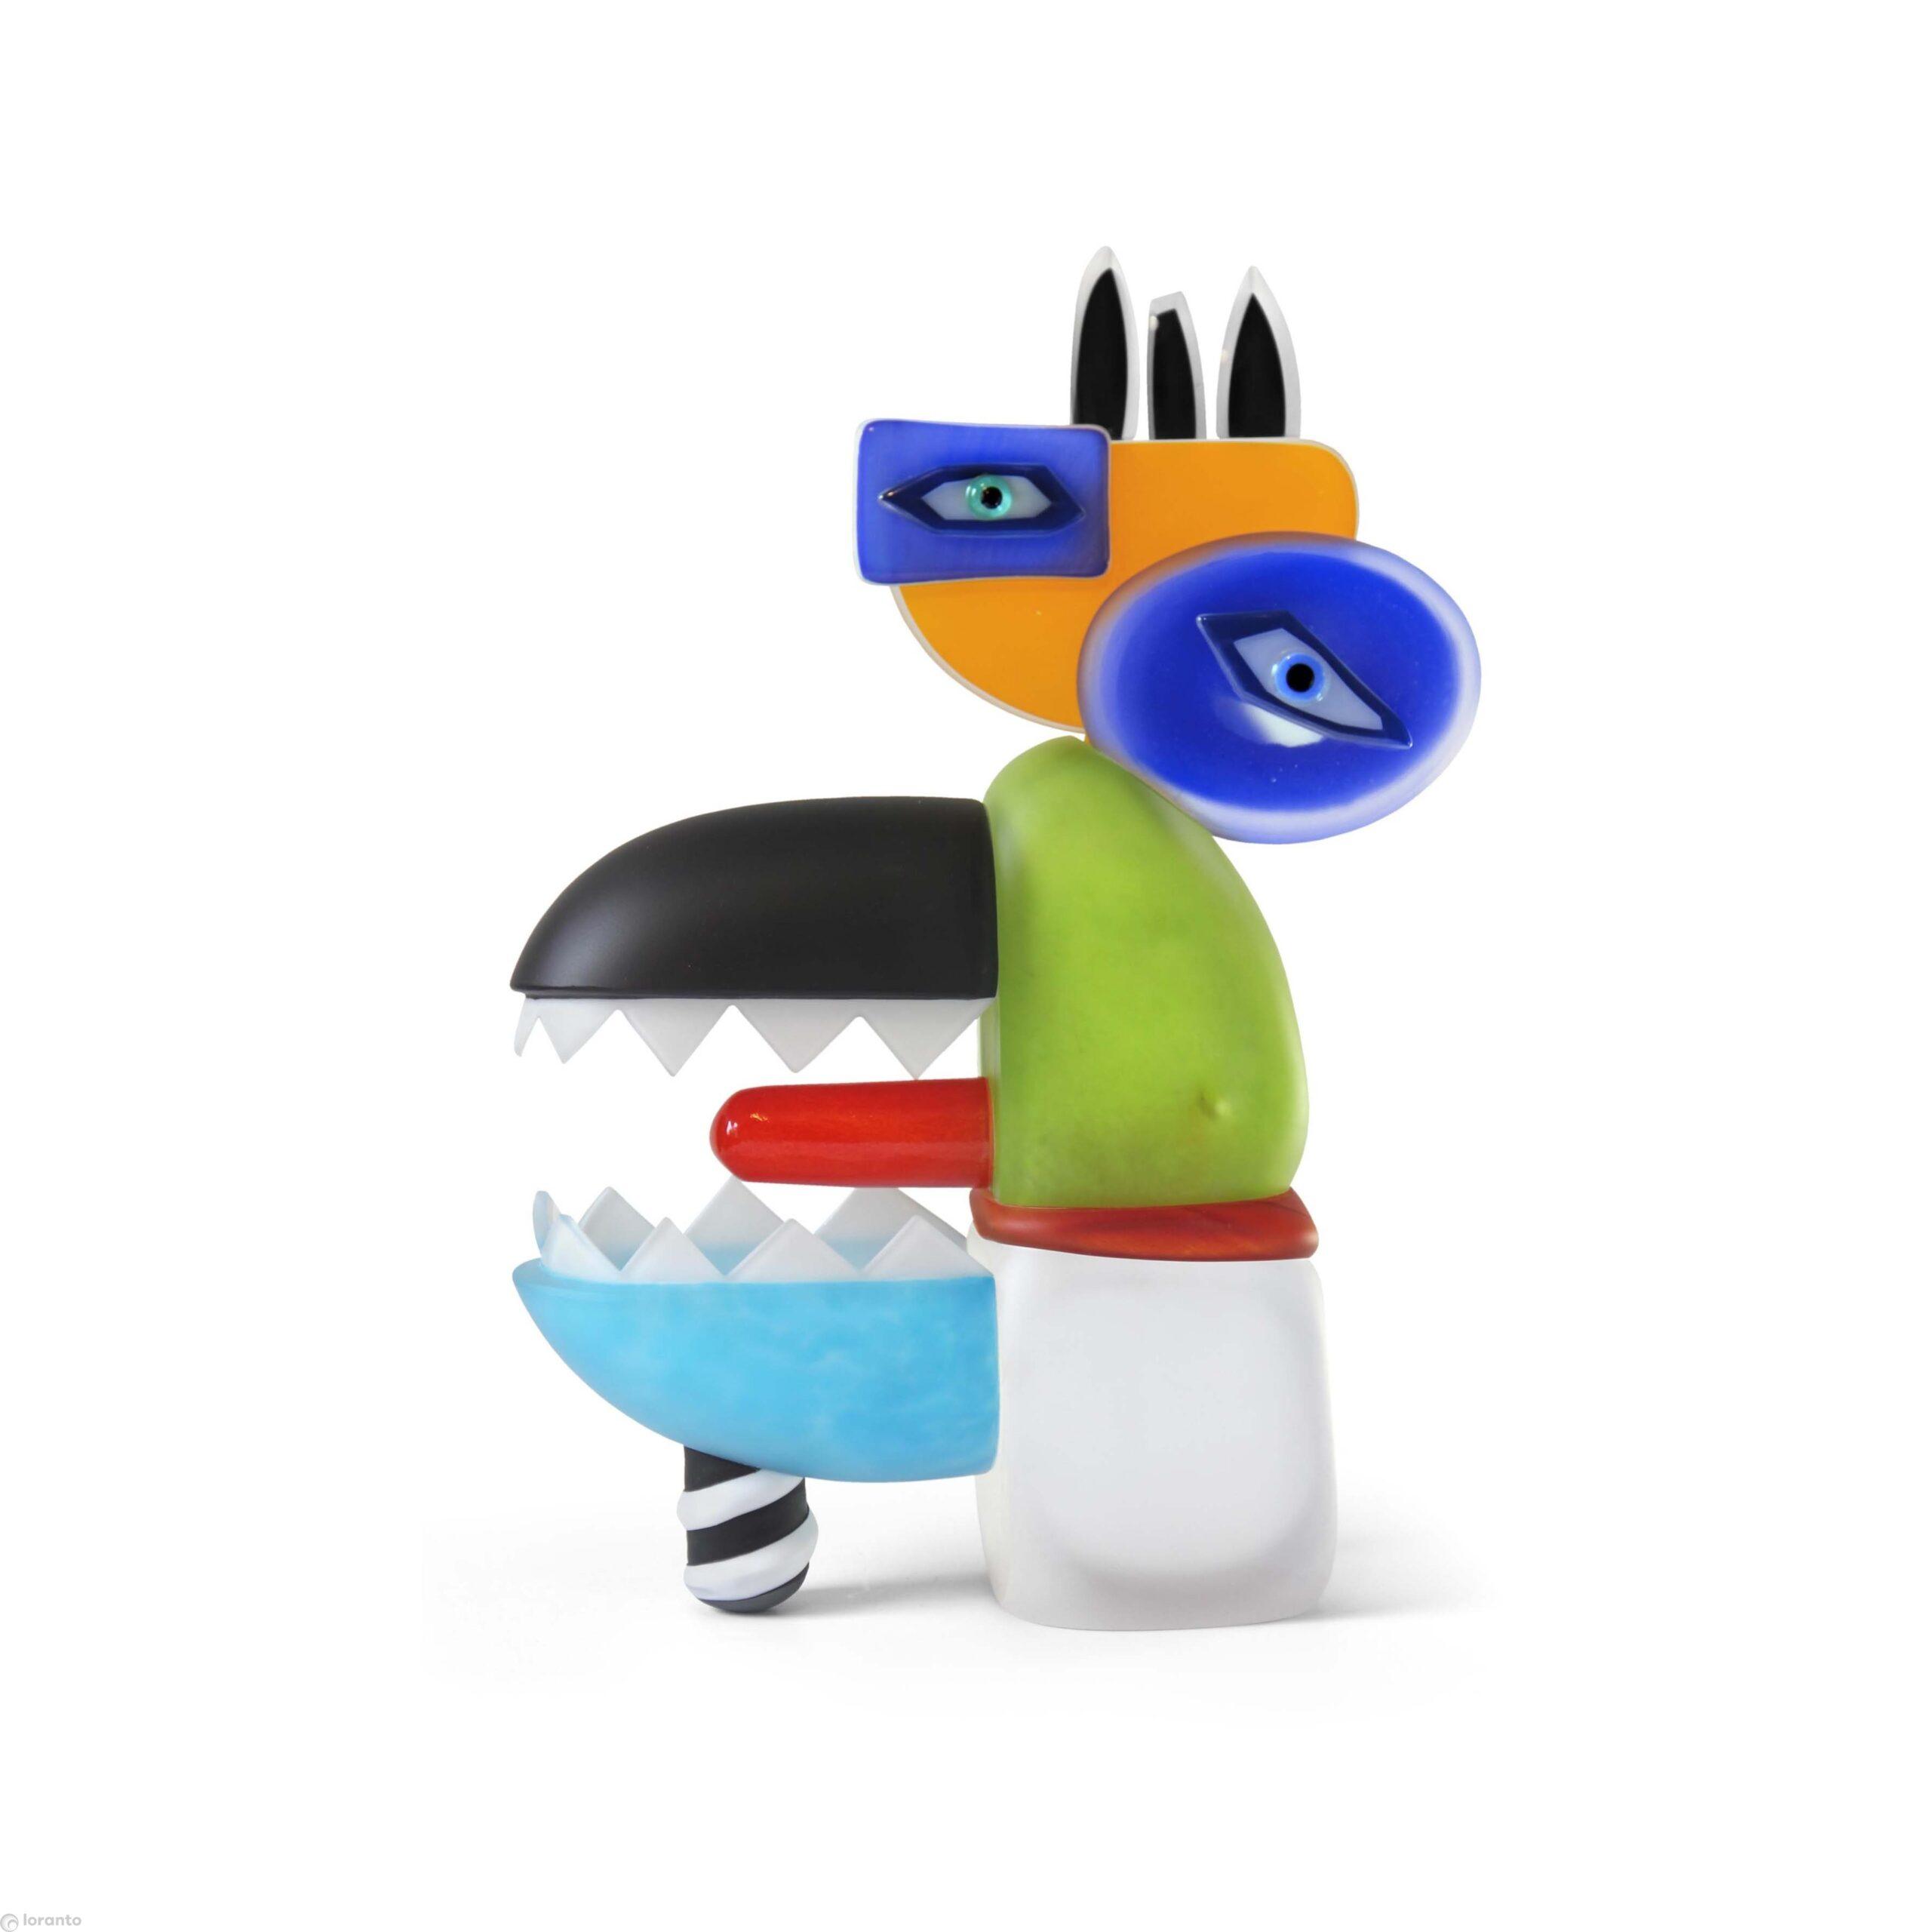 Loranto Ozzaro glazen beeld 'Sea Wolf'